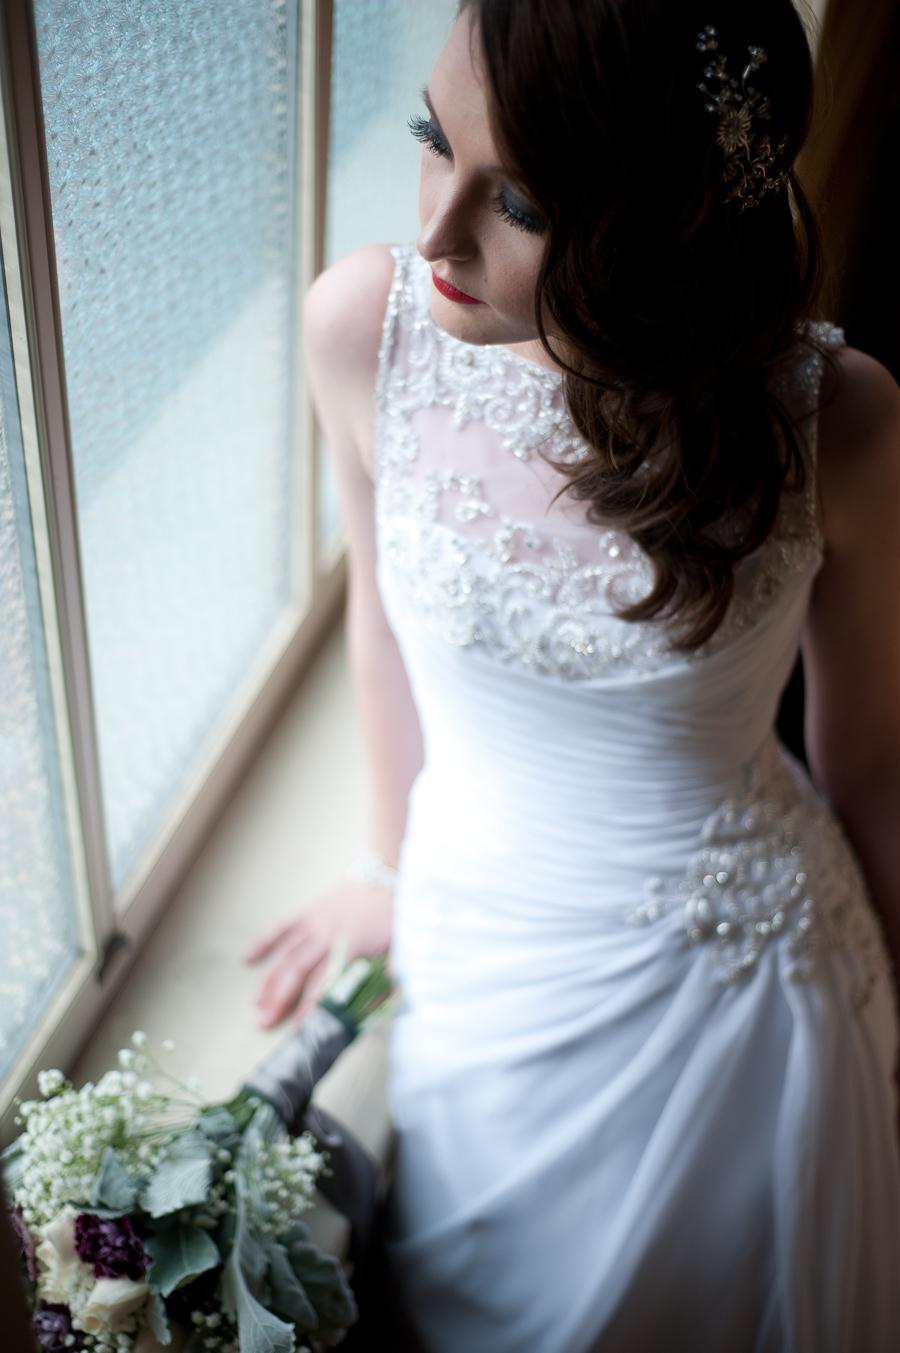 Susannah_Deangelo_Antique_Silver_Music_Hall_Wedding-23.jpg